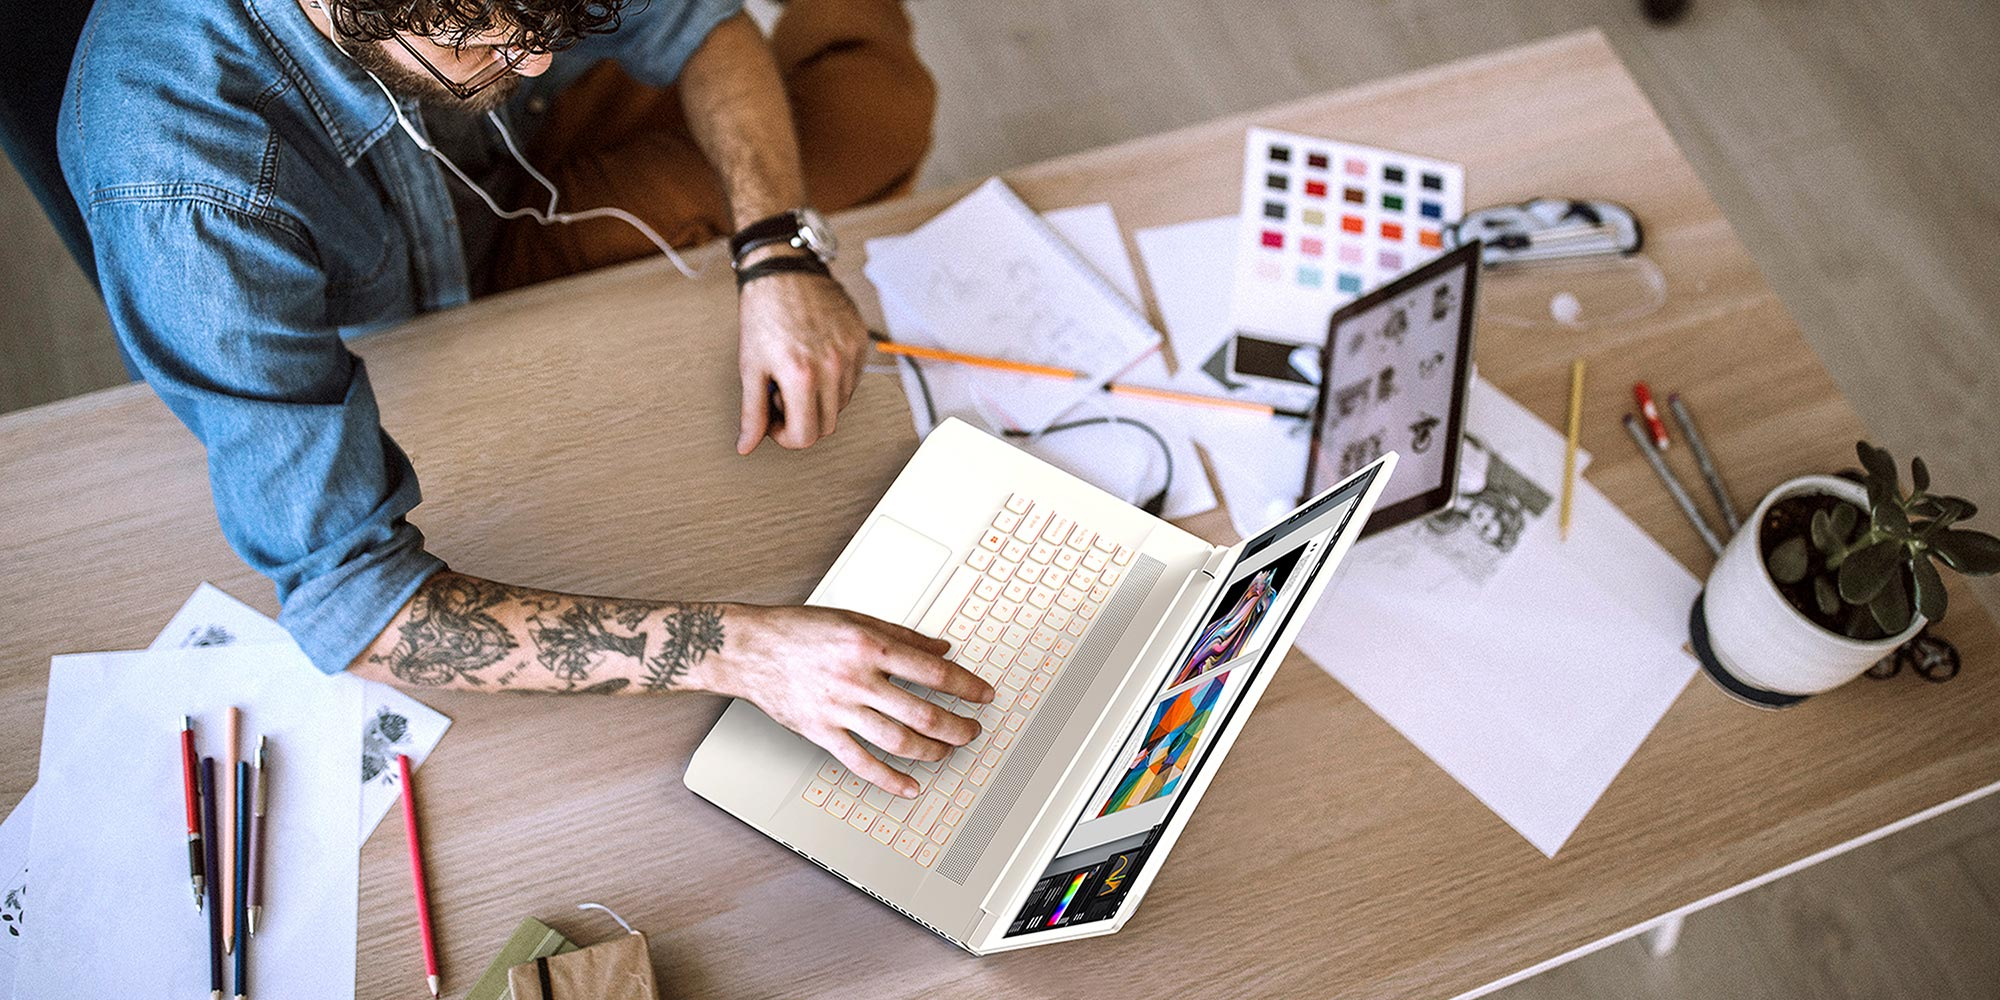 acer conceptd 7 laptop